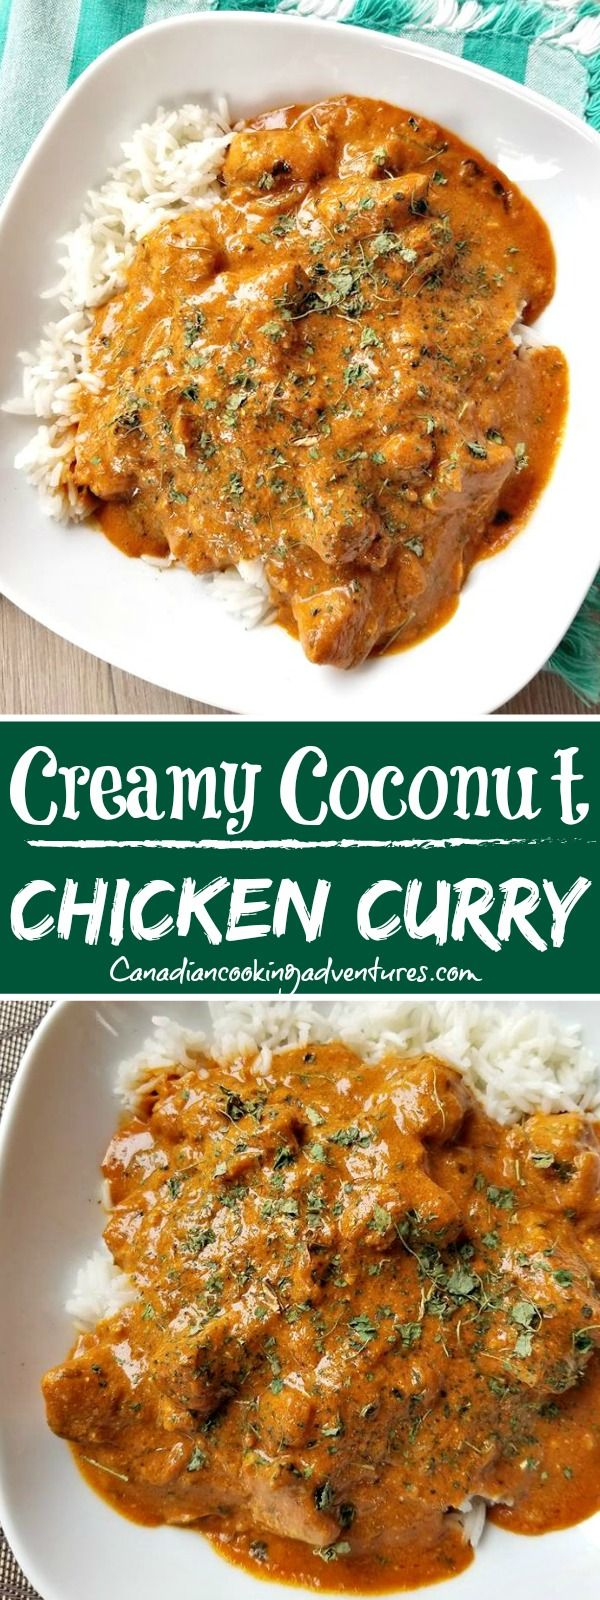 Creamy Coconut Chicken Curry